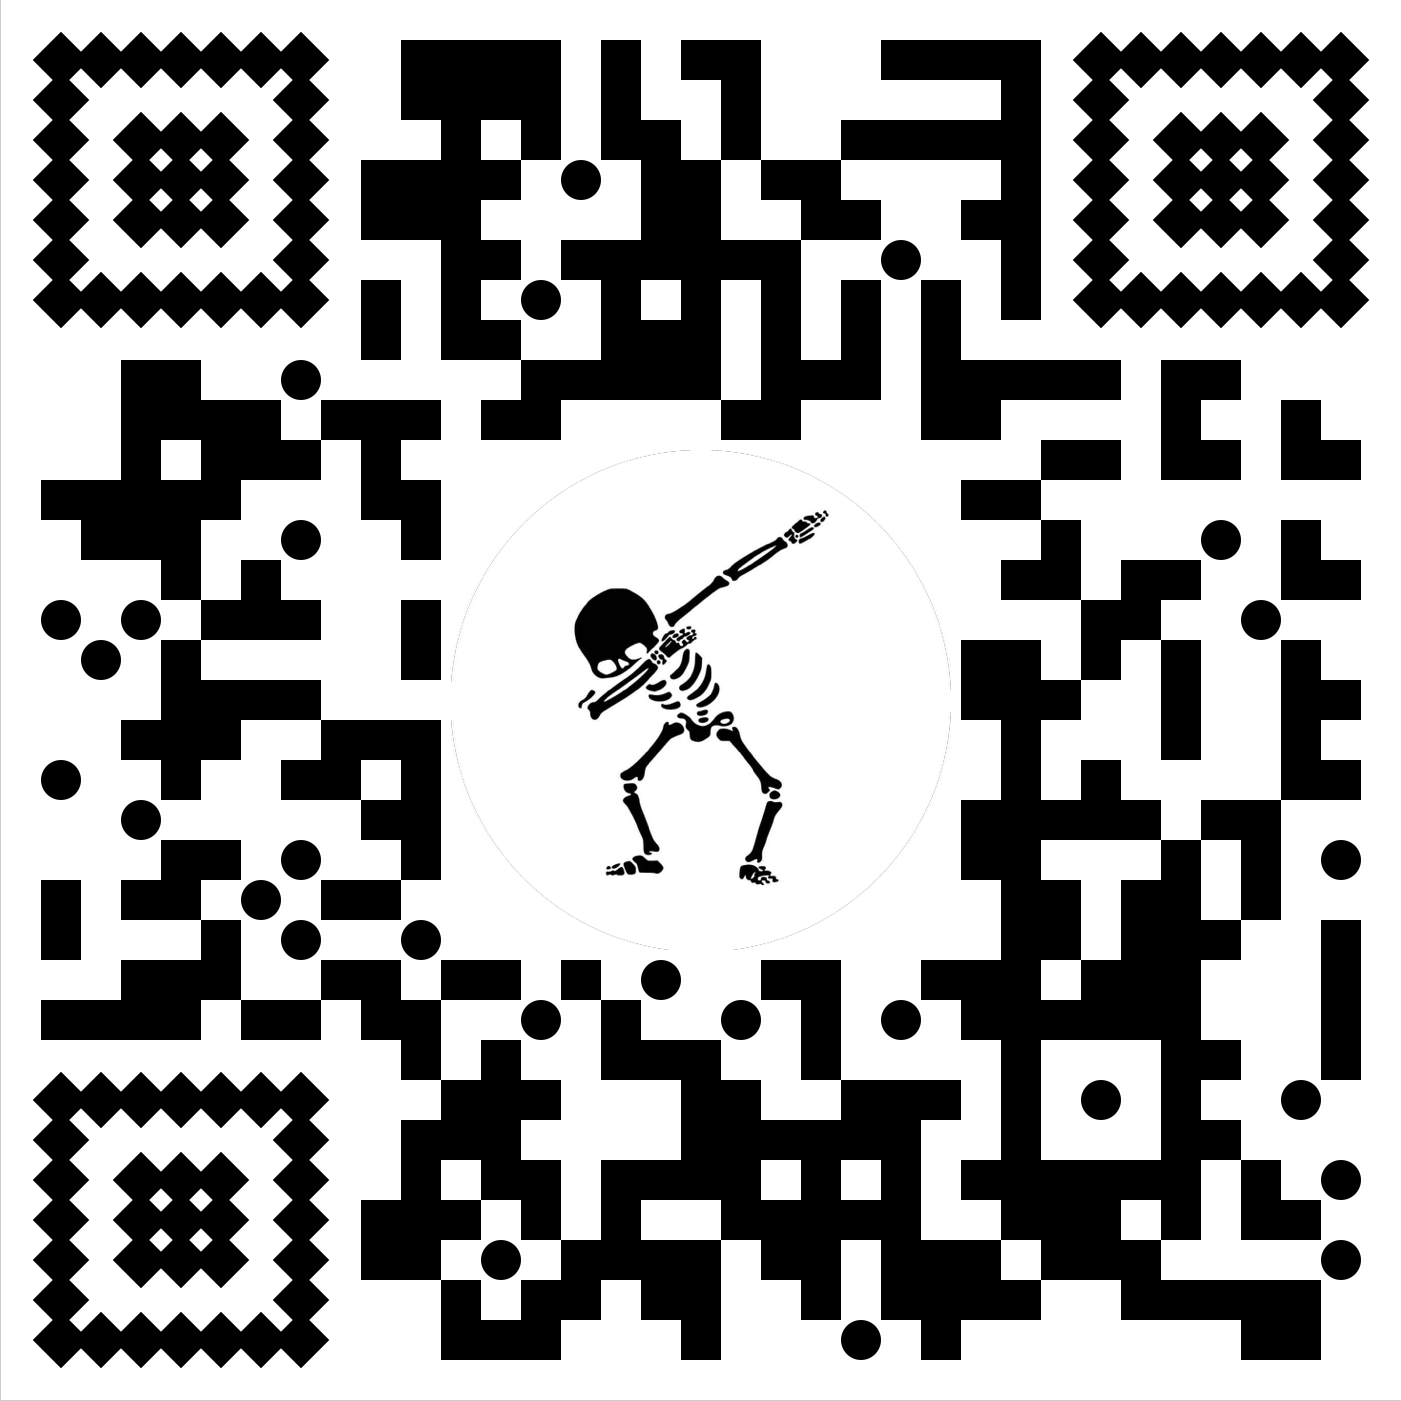 react-native-custom-qr-codes - npm